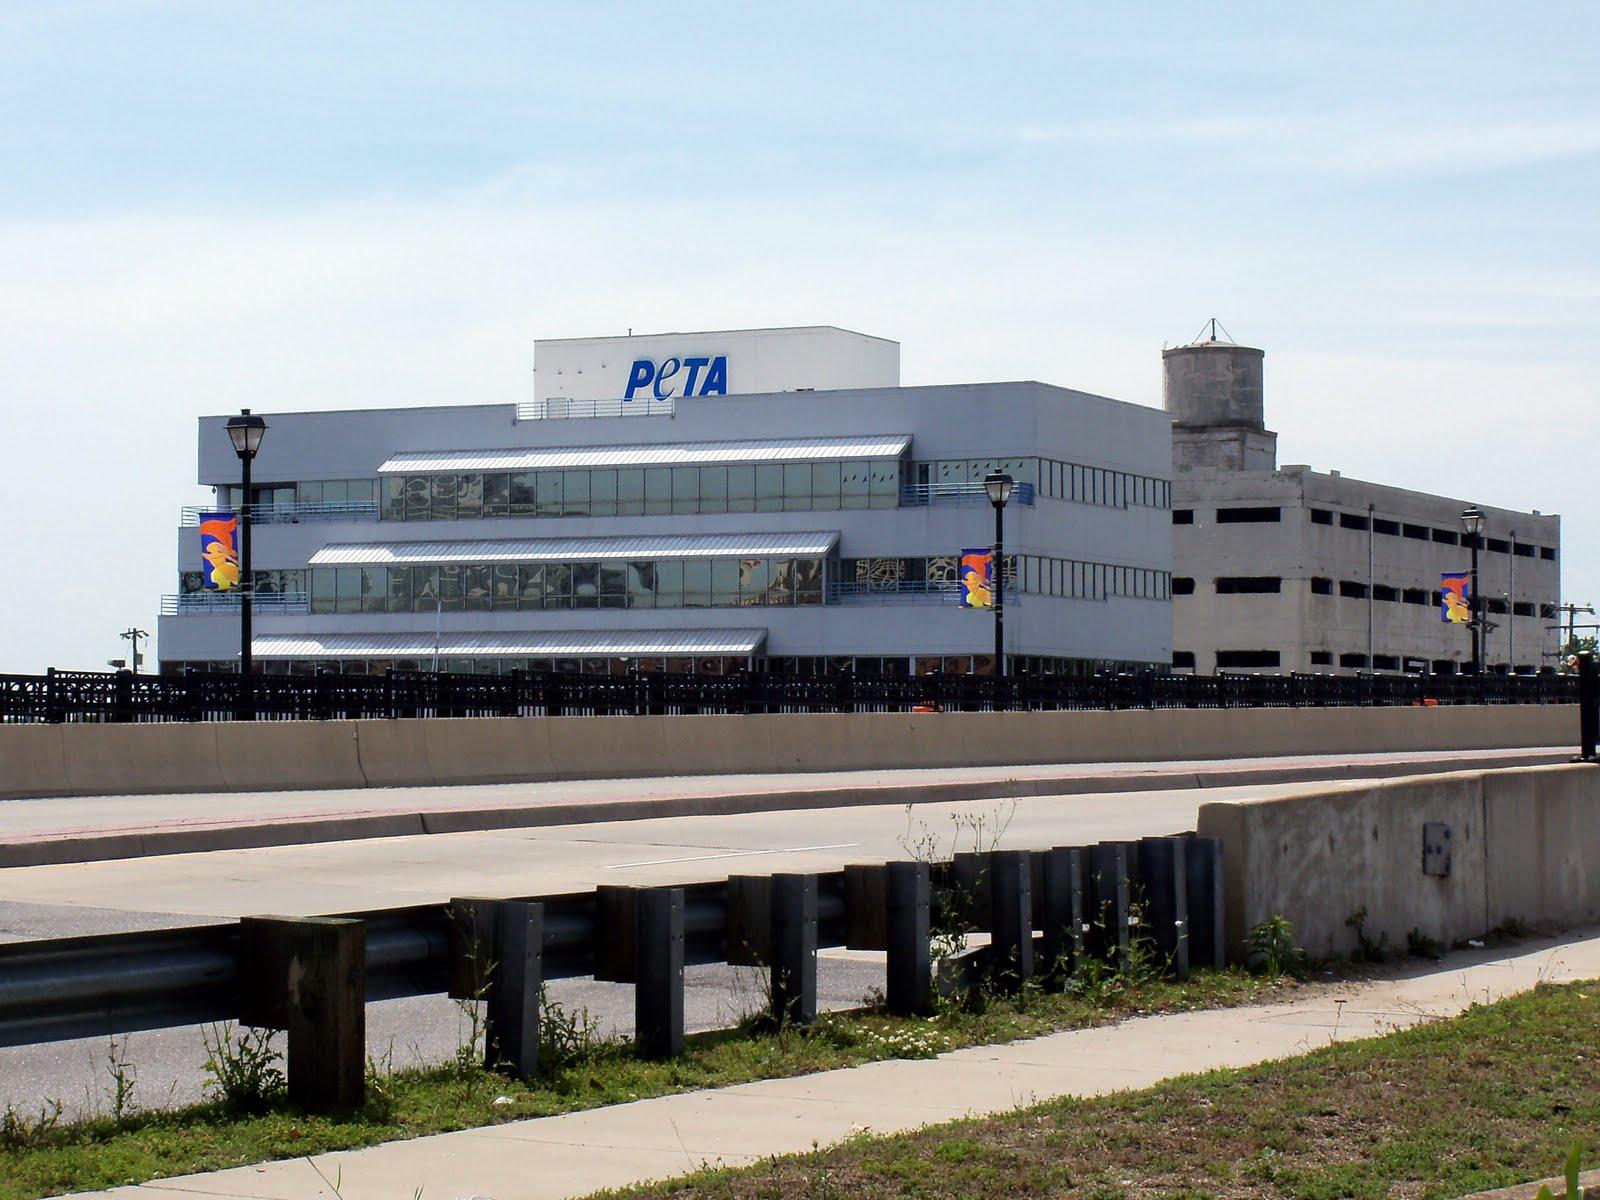 Picture of PETA HQ in Norfolk, Va. - May 2010